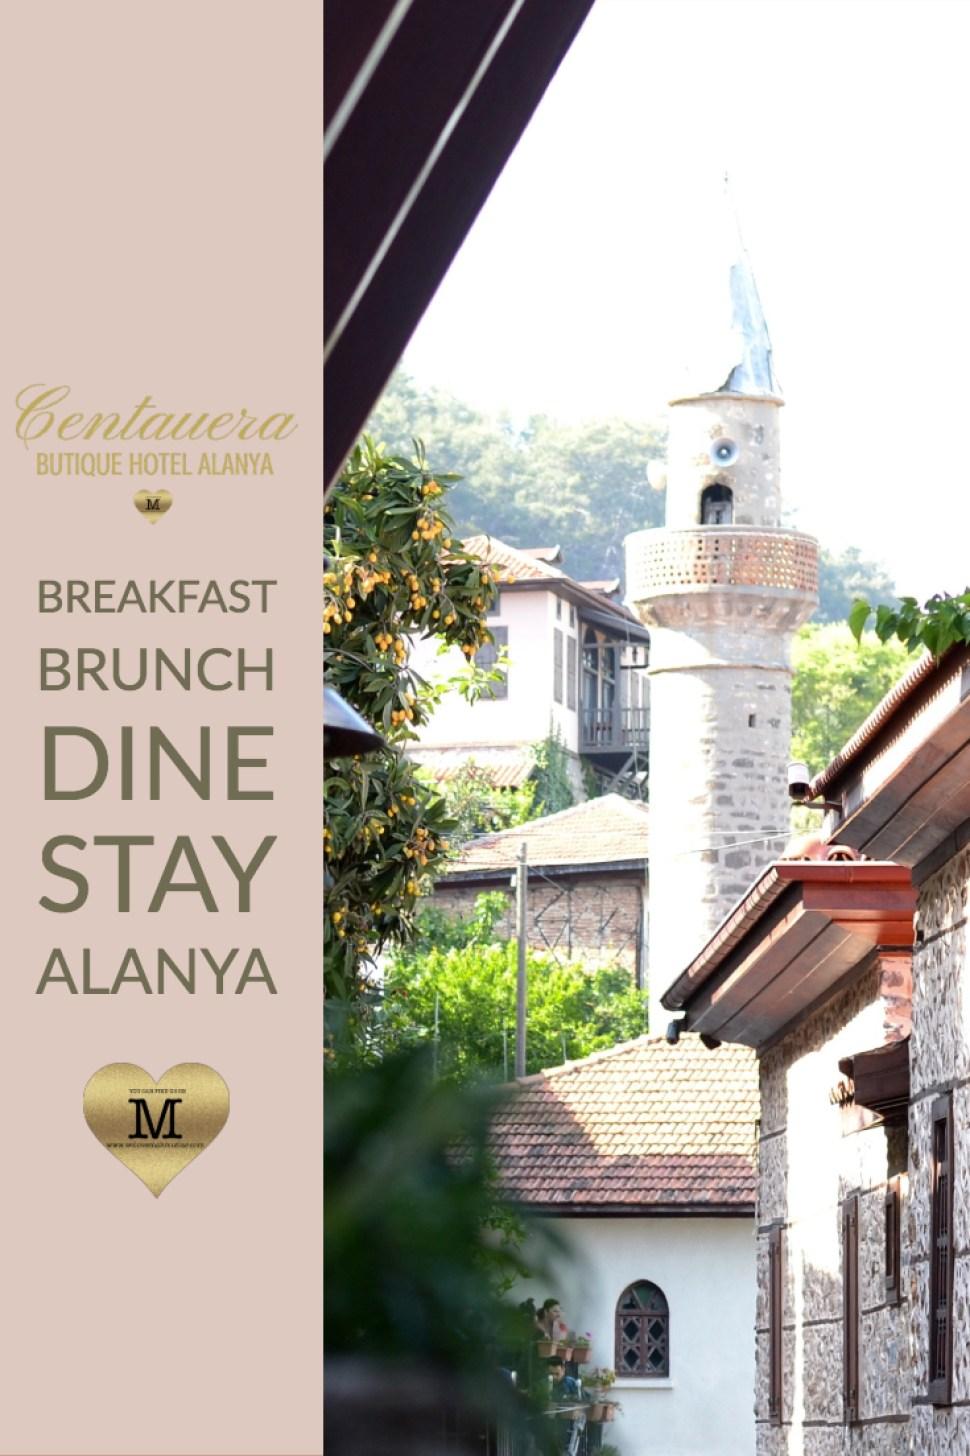 CENTAUERA BOUTIQUE HOTEL ALANYA - WE LOVE ALANYA & MAHMUTLAR